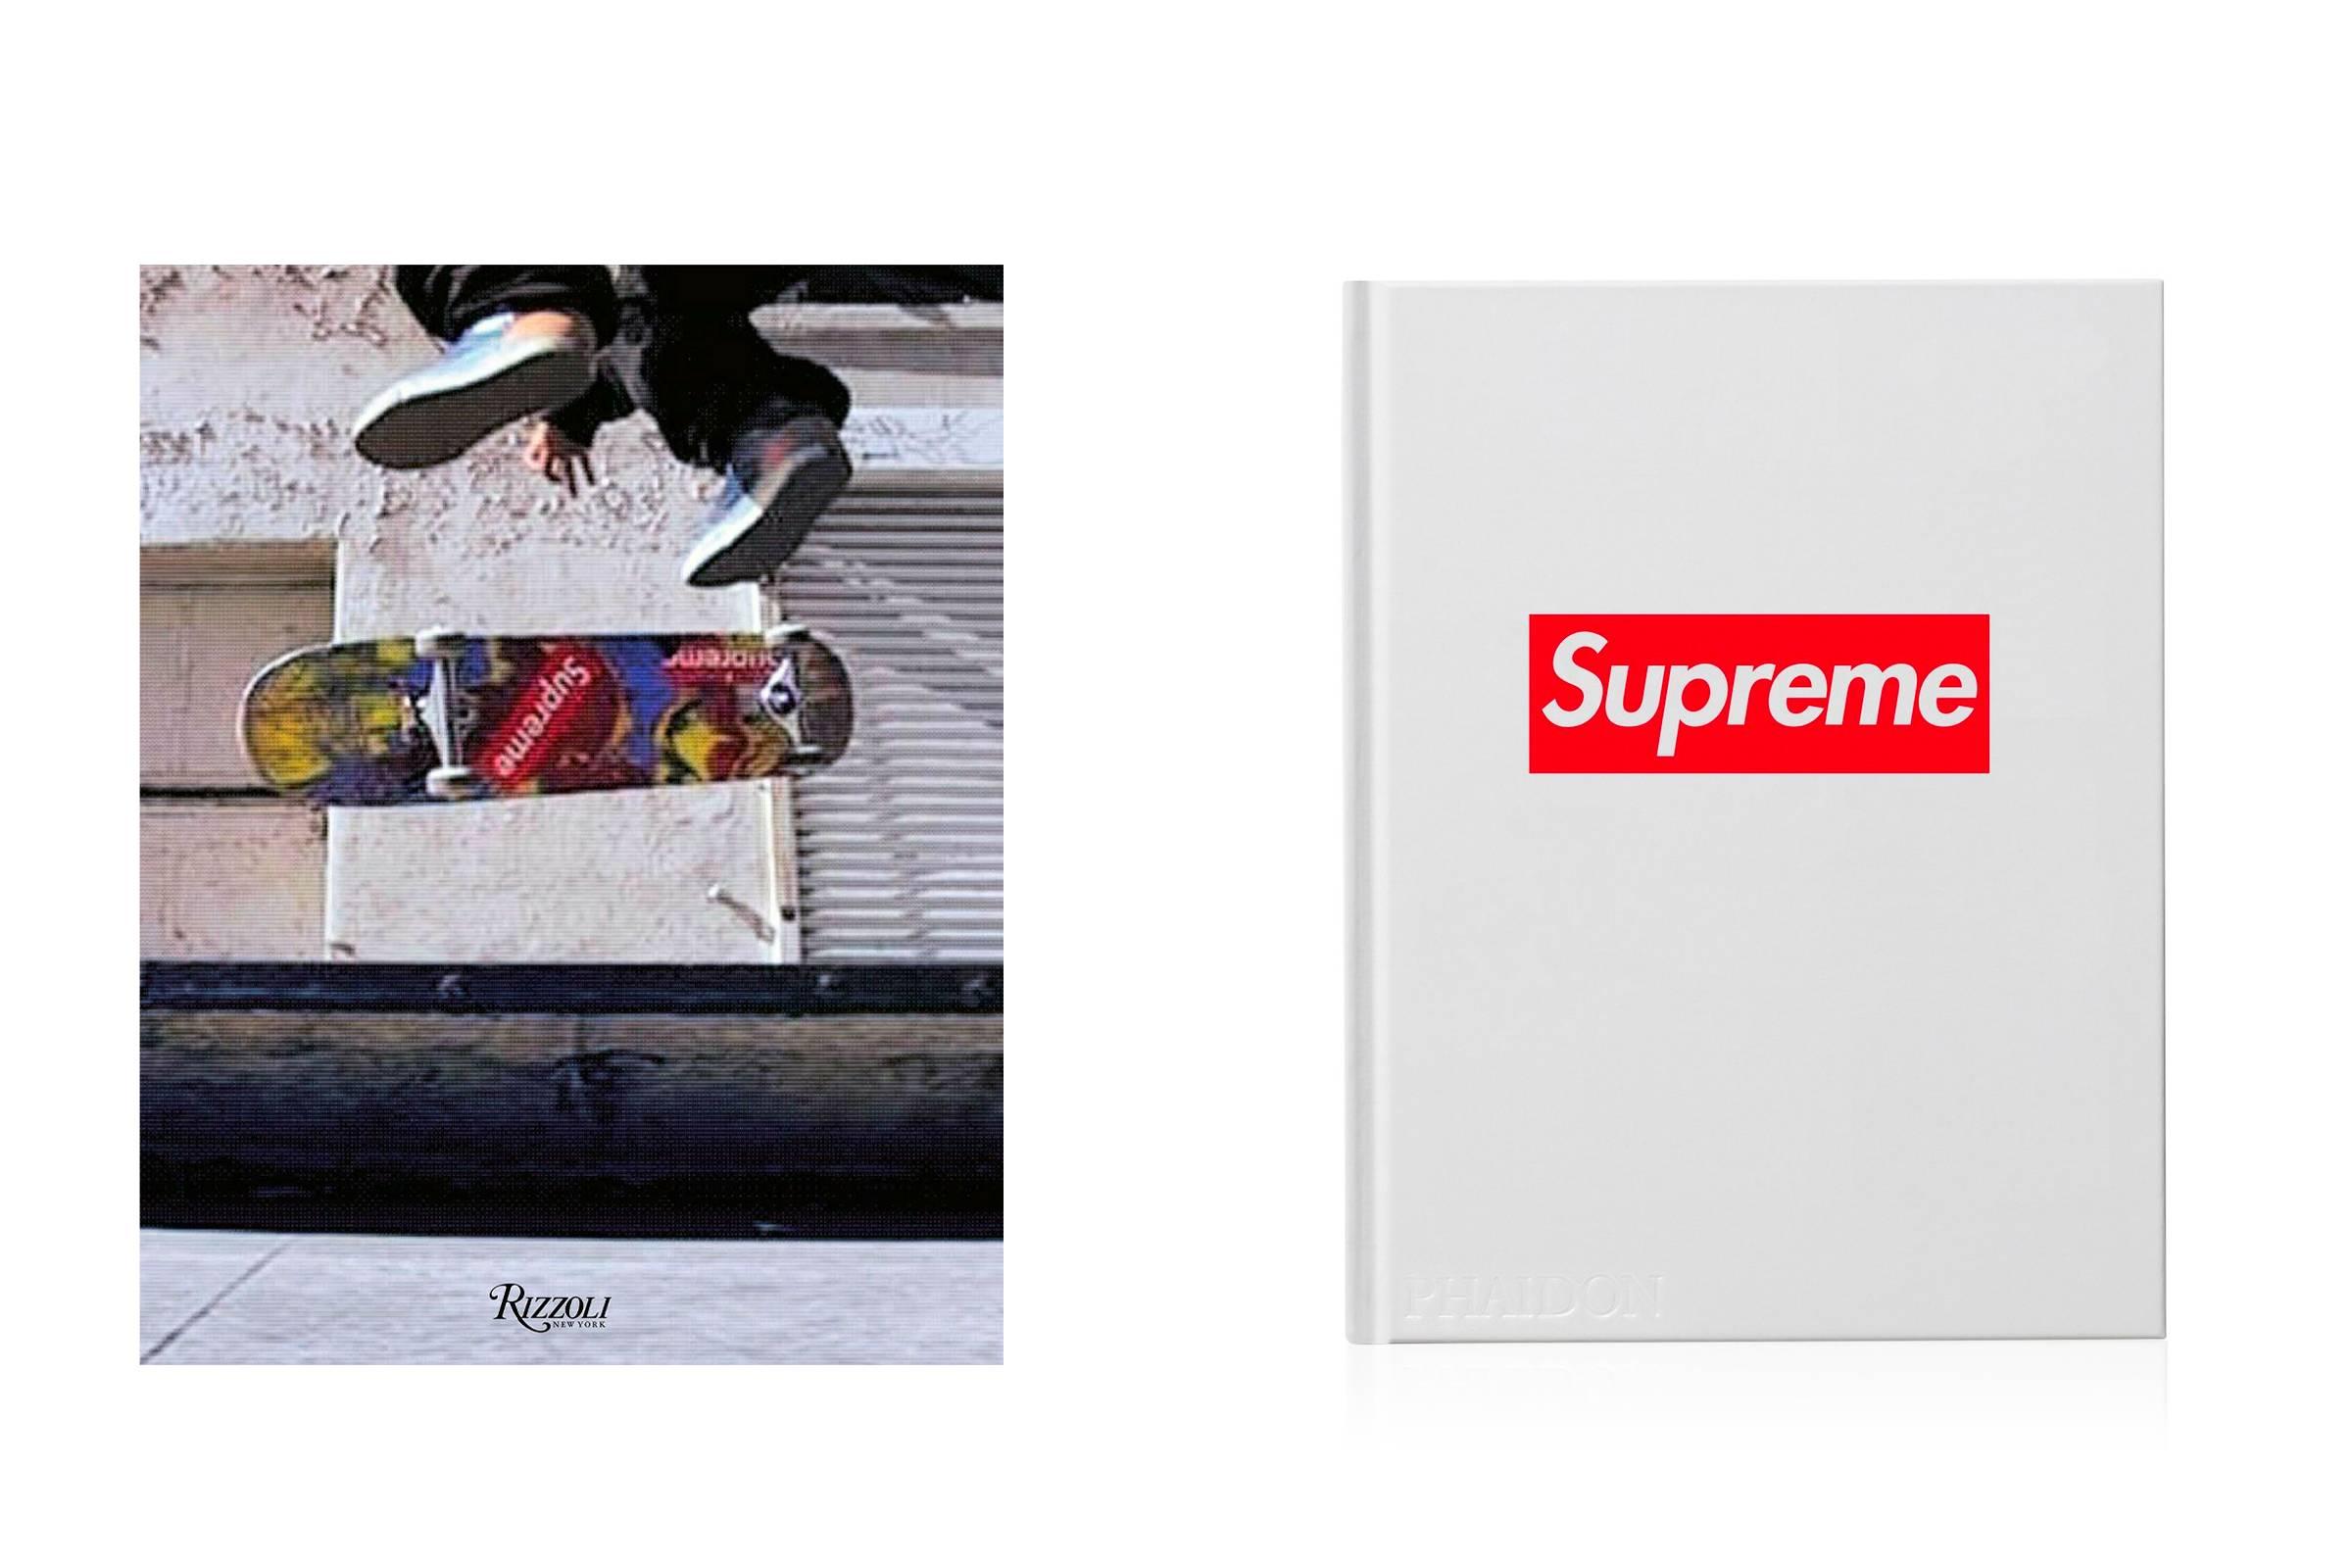 """Supreme"" (2010) and ""Supreme"" (2020)"